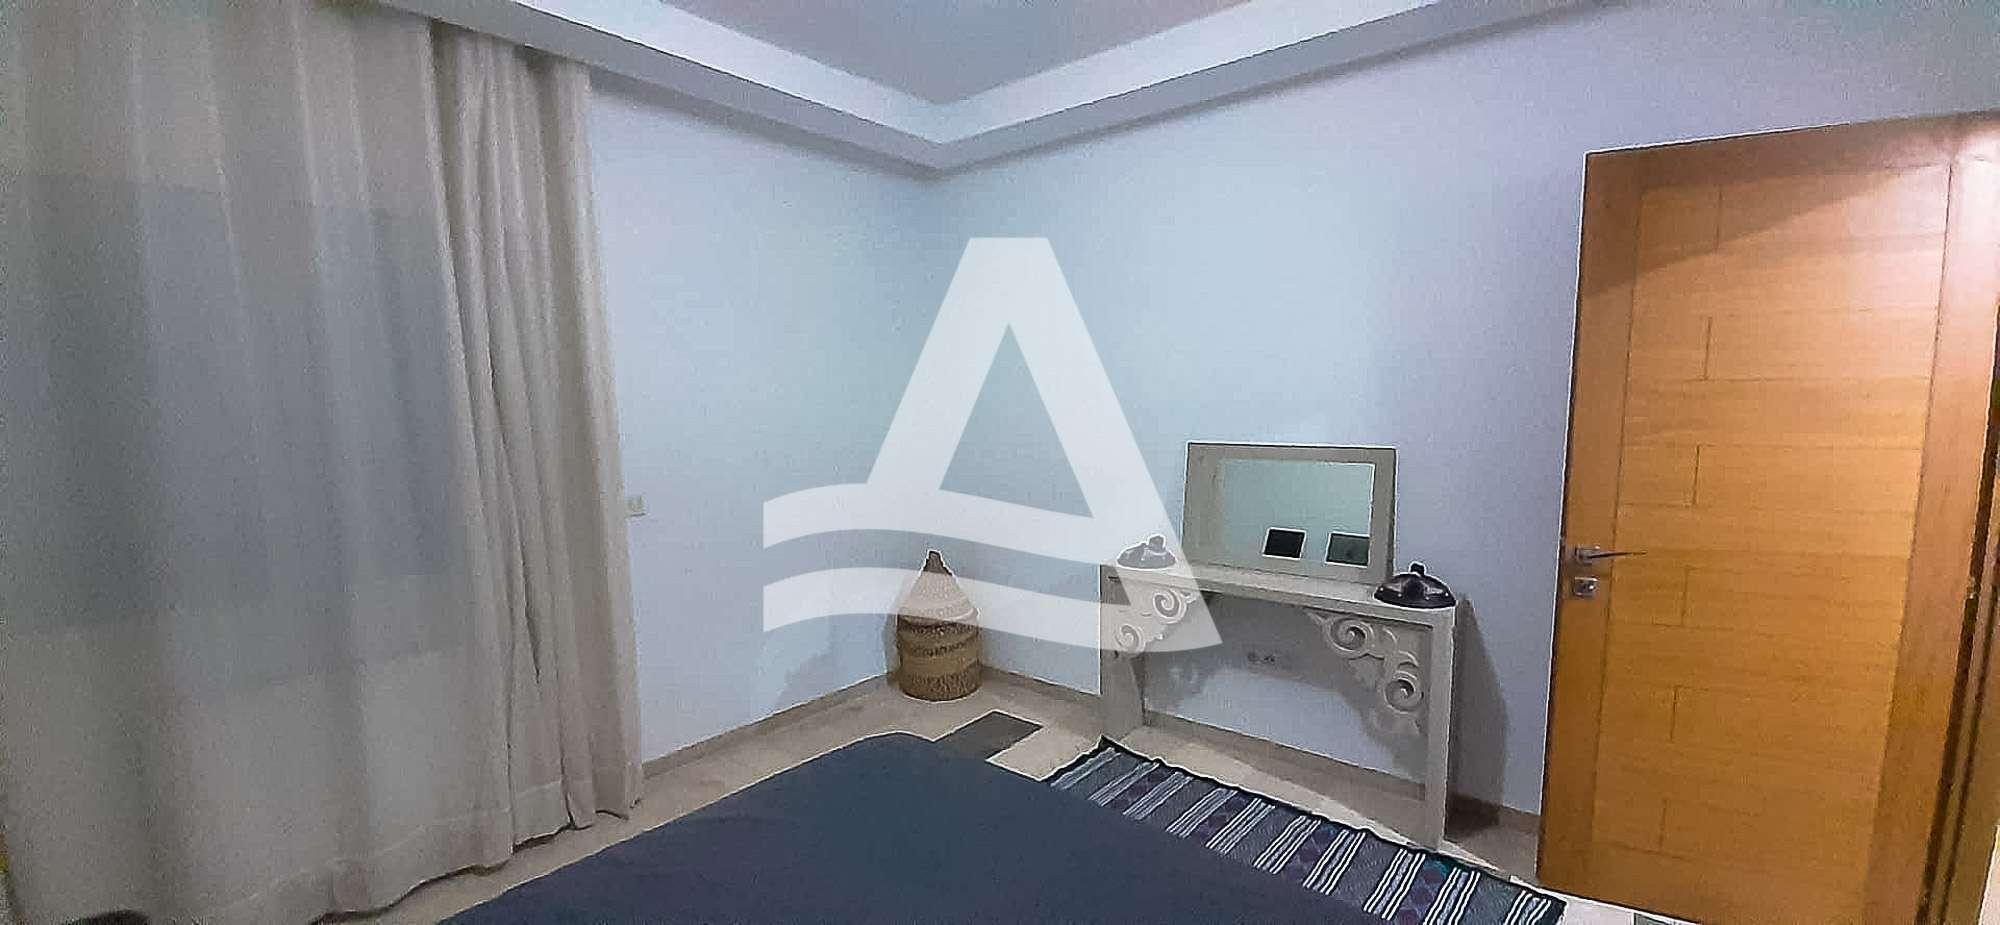 httpss3.amazonaws.comlogimoaws_Arcane_immobilière_la_Marsa-_location_-_vente_la_marsa_7_sur_12_1574867274158